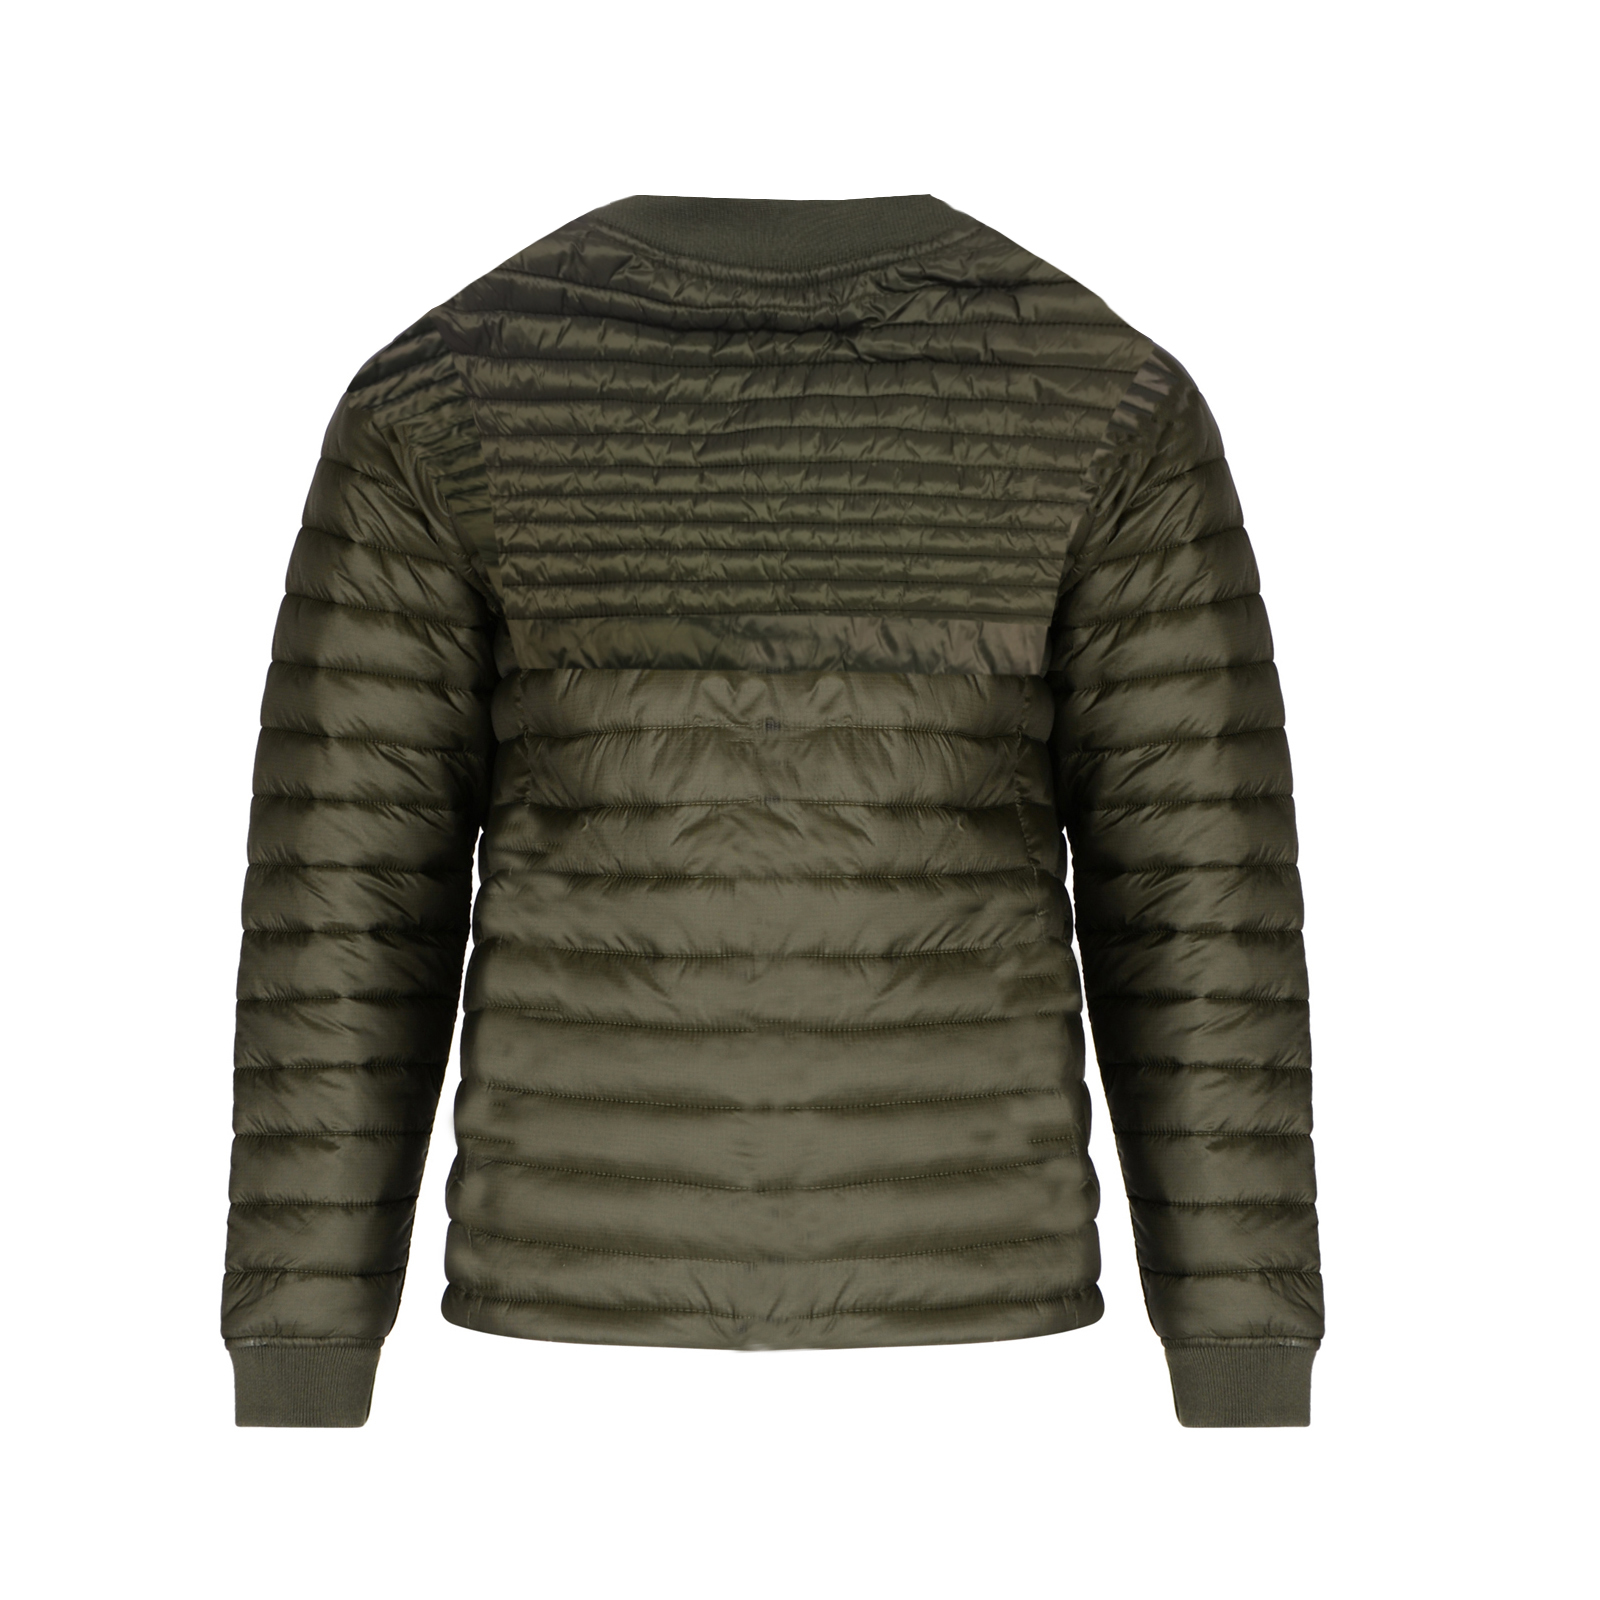 Threadbare-Mens-Naples-MA1-Bomber-Jacket-Designer-Quilted-Winter-Padded-Coat thumbnail 6